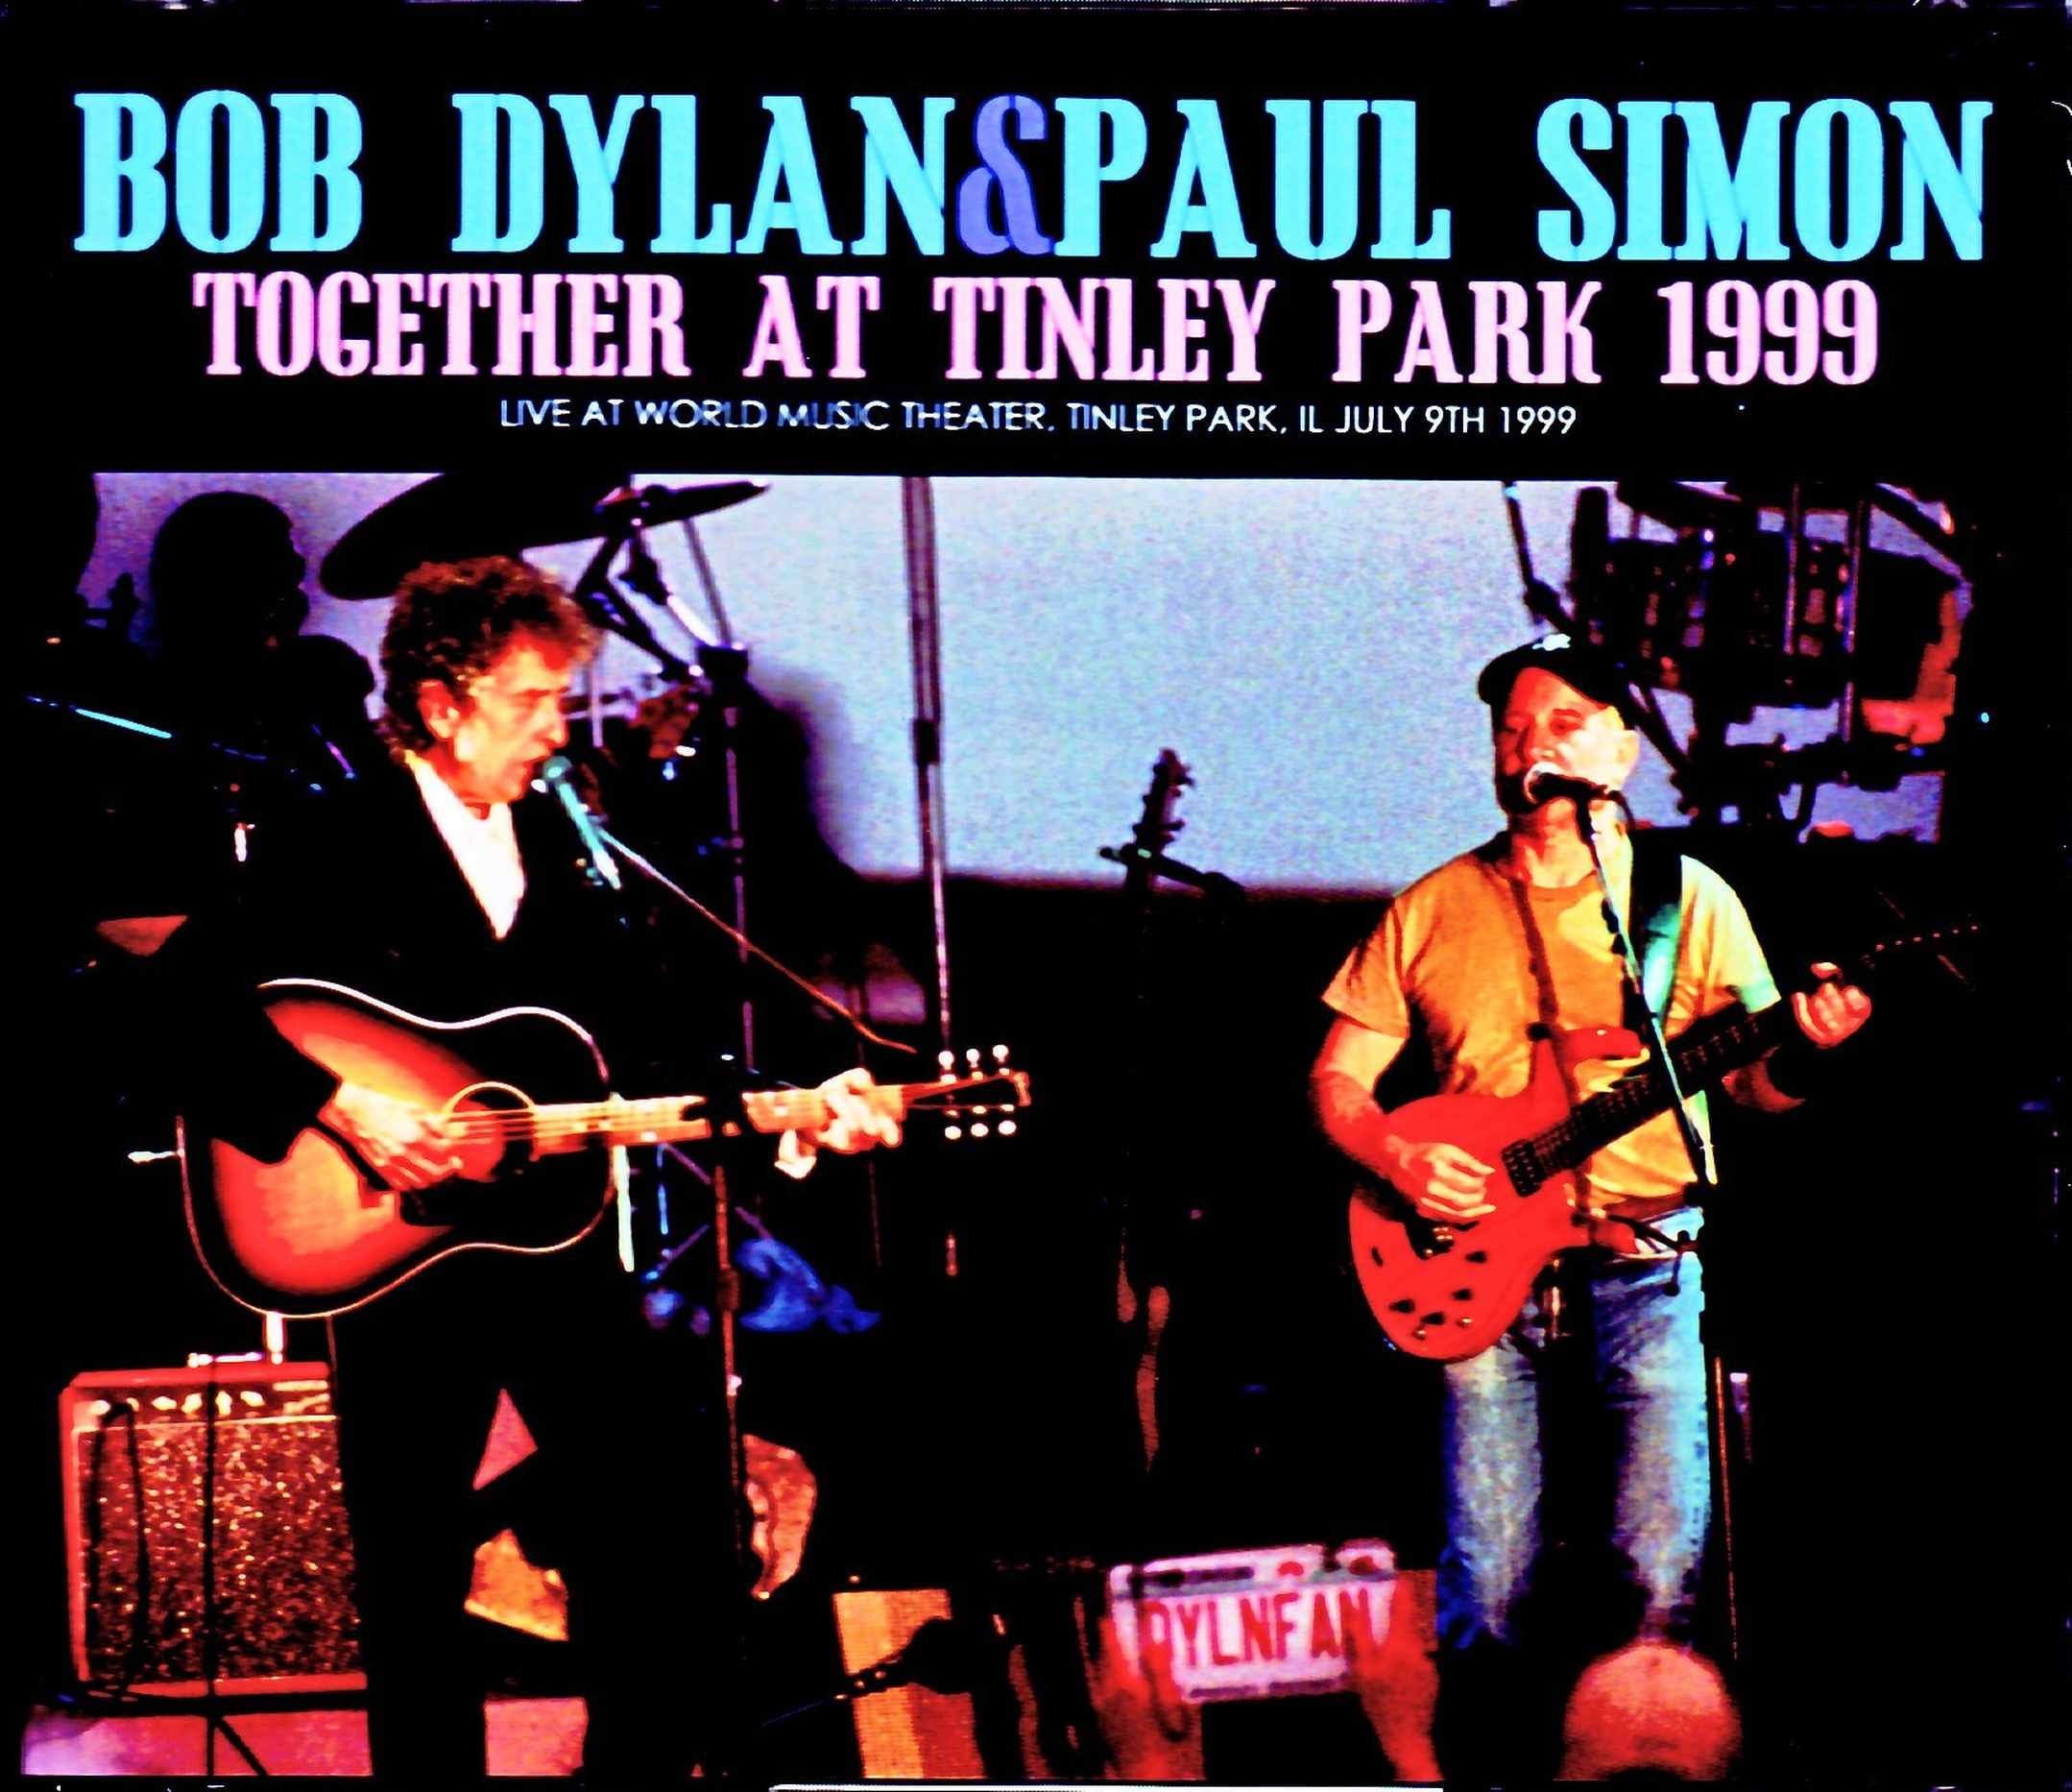 Bob Dylan,Paul Simon ボブ・ディラン ポール・サイモン/IL,USA 1999 Complete